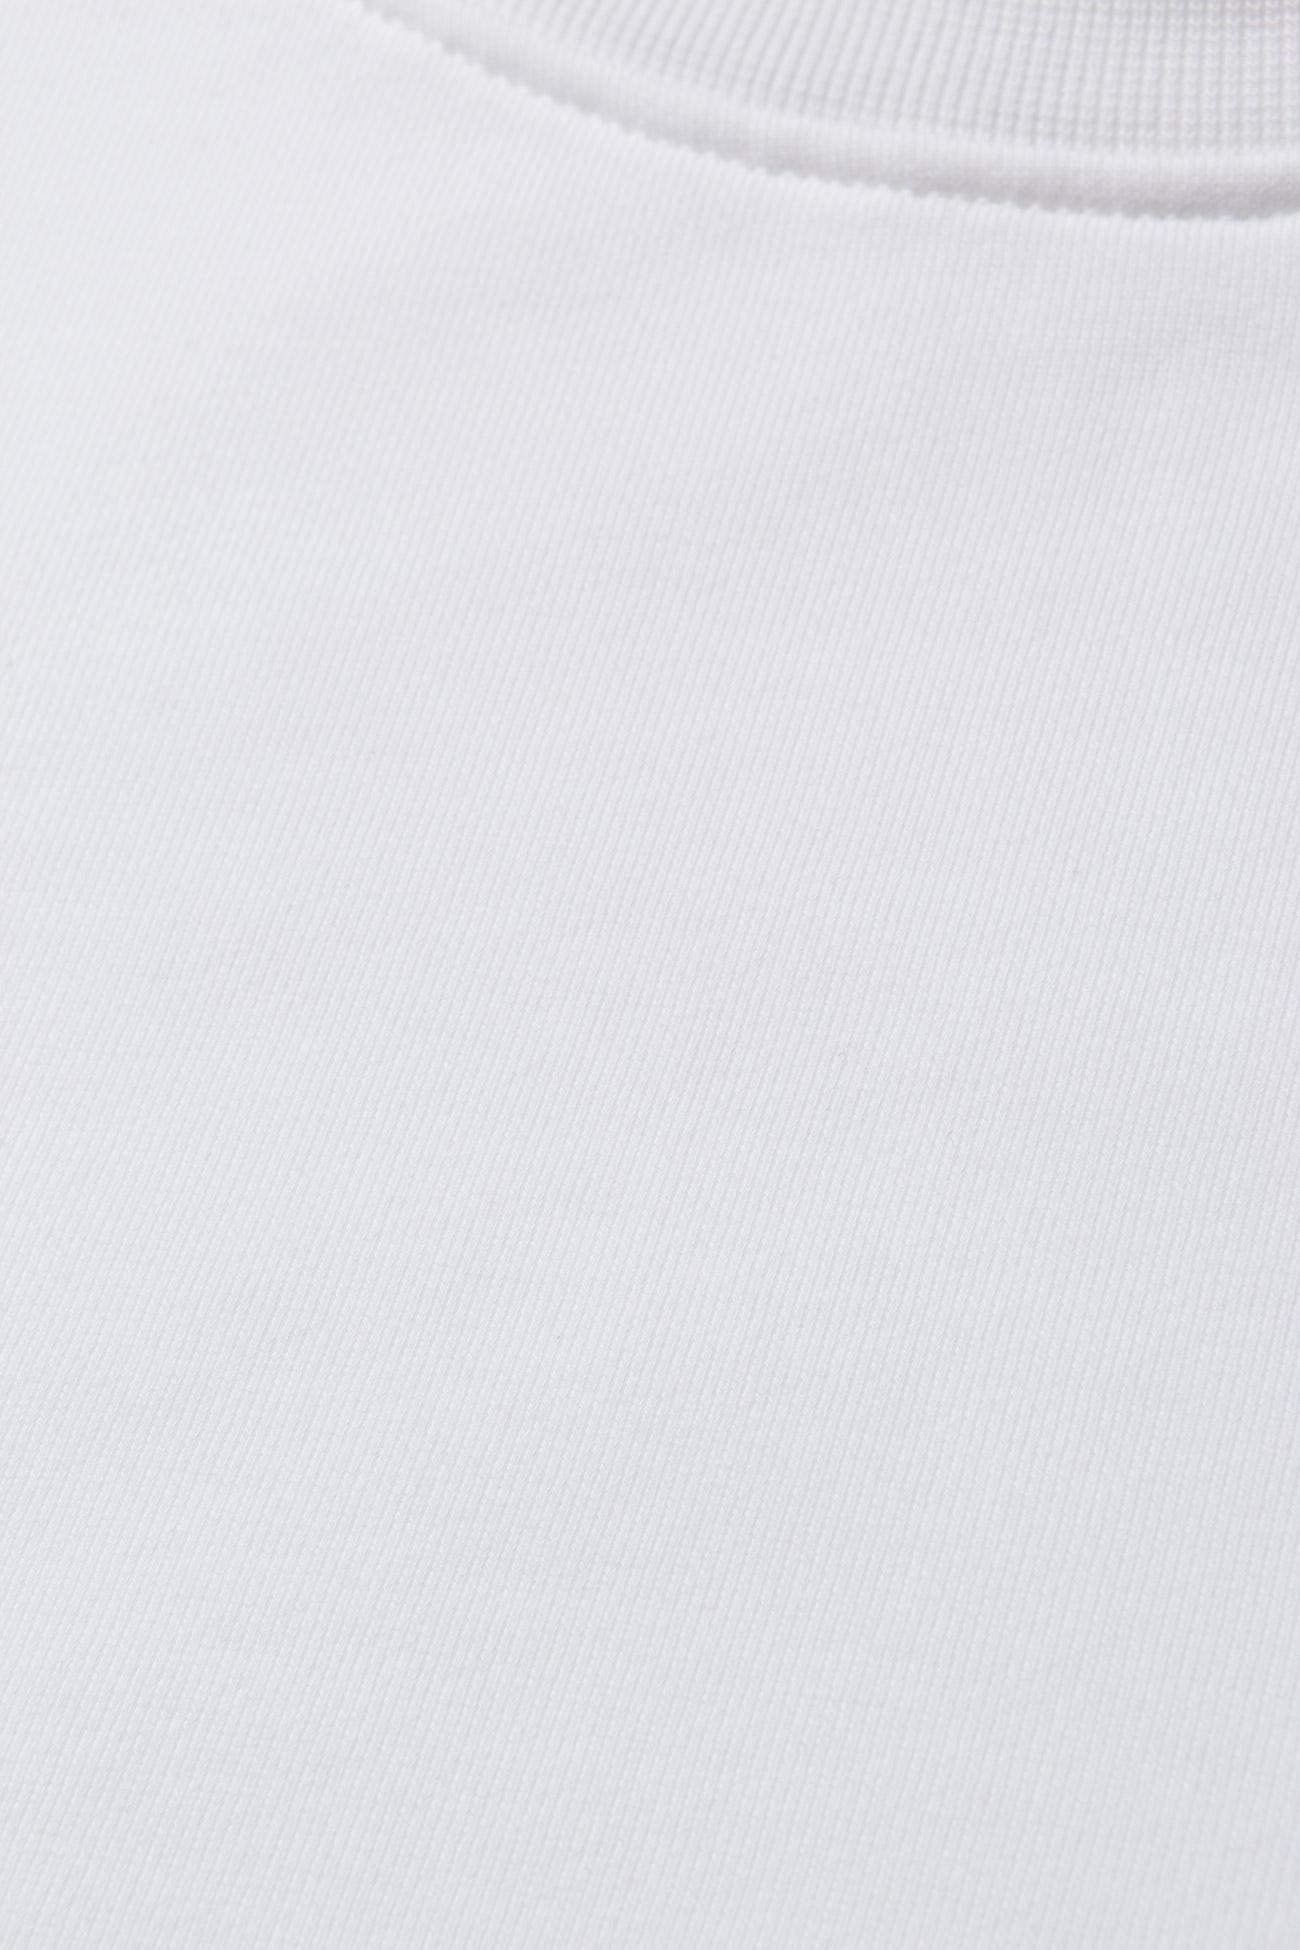 J. Lindeberg Rubina Stitched Sweat - Sweatshirts WHITE